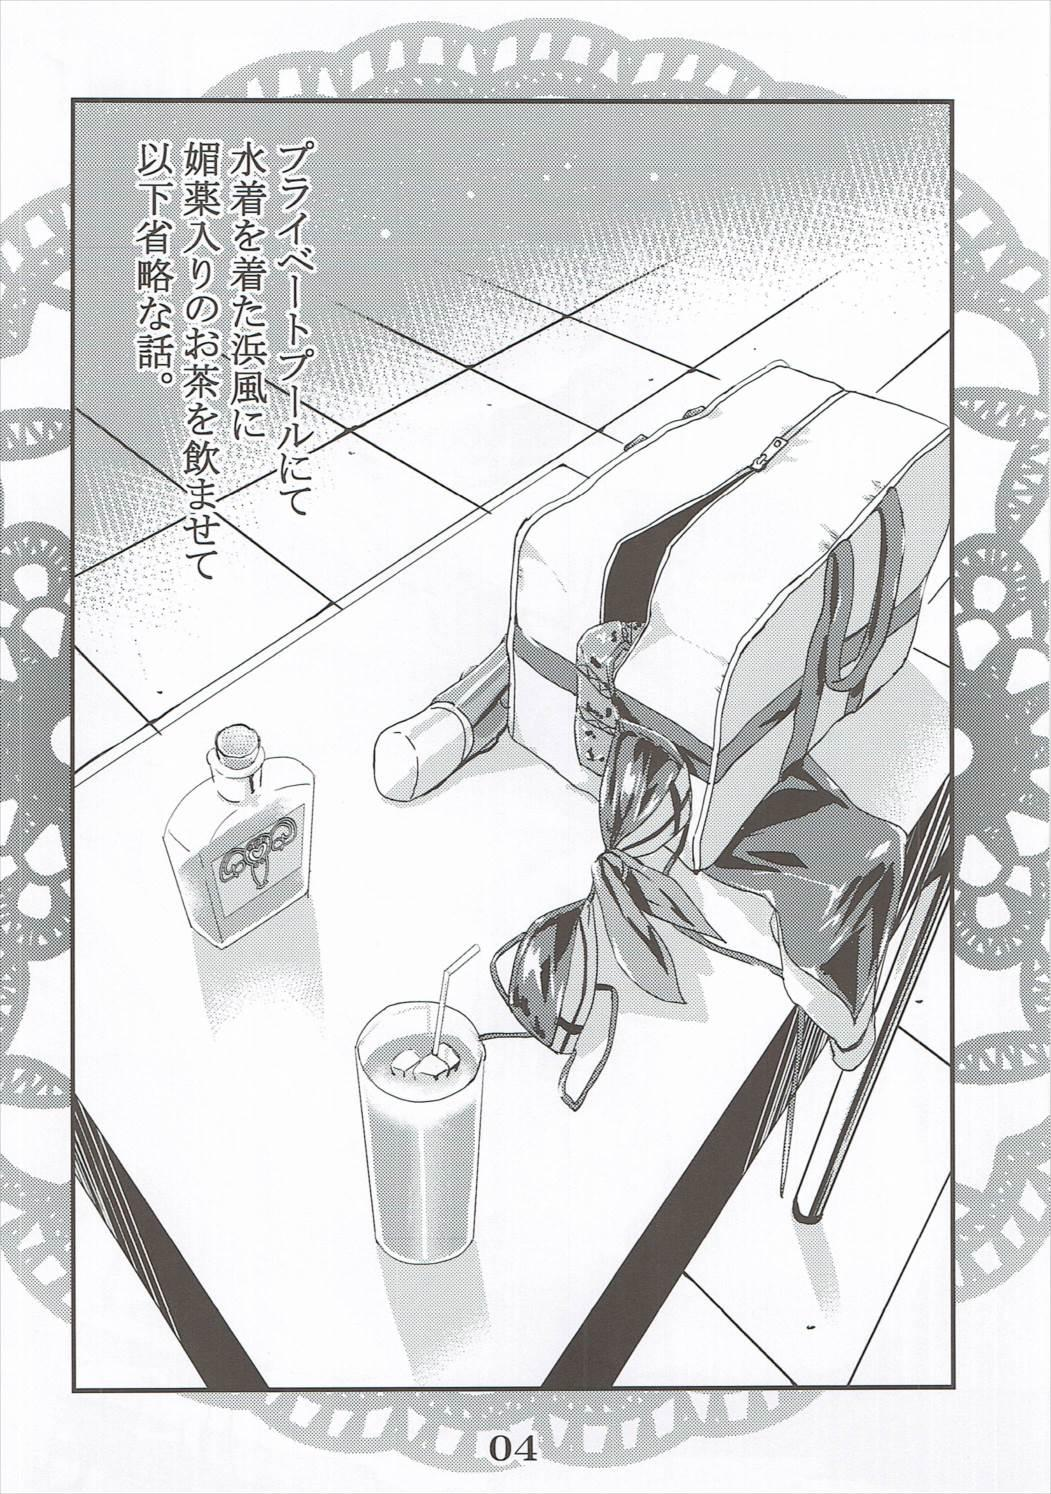 Rensou Harugatari 20 2